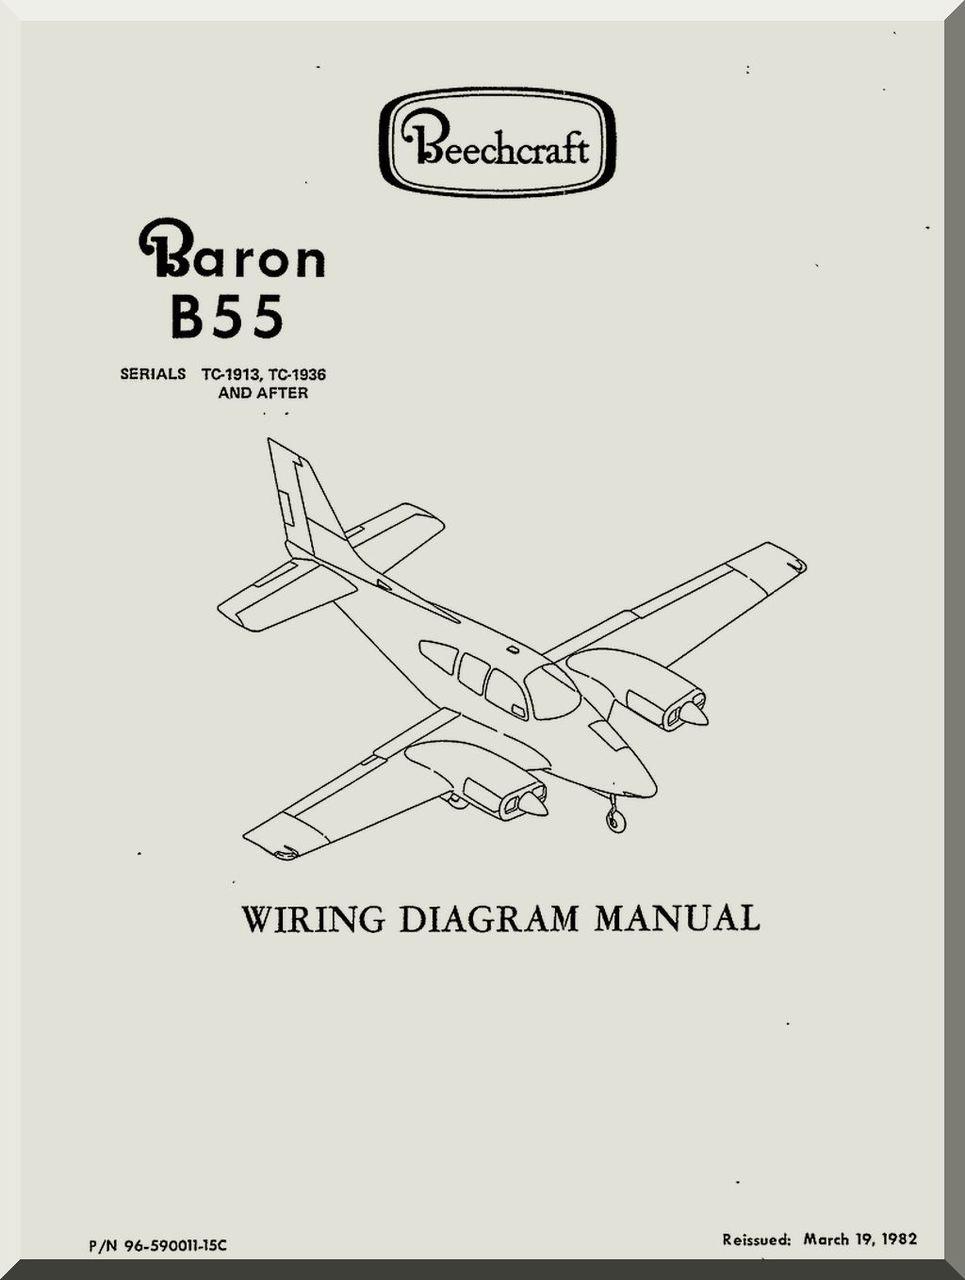 beechcraft baron b 55 aircraft wiring diagram manual aircraft rh aircraft reports com  aircraft wiring diagram manual definition